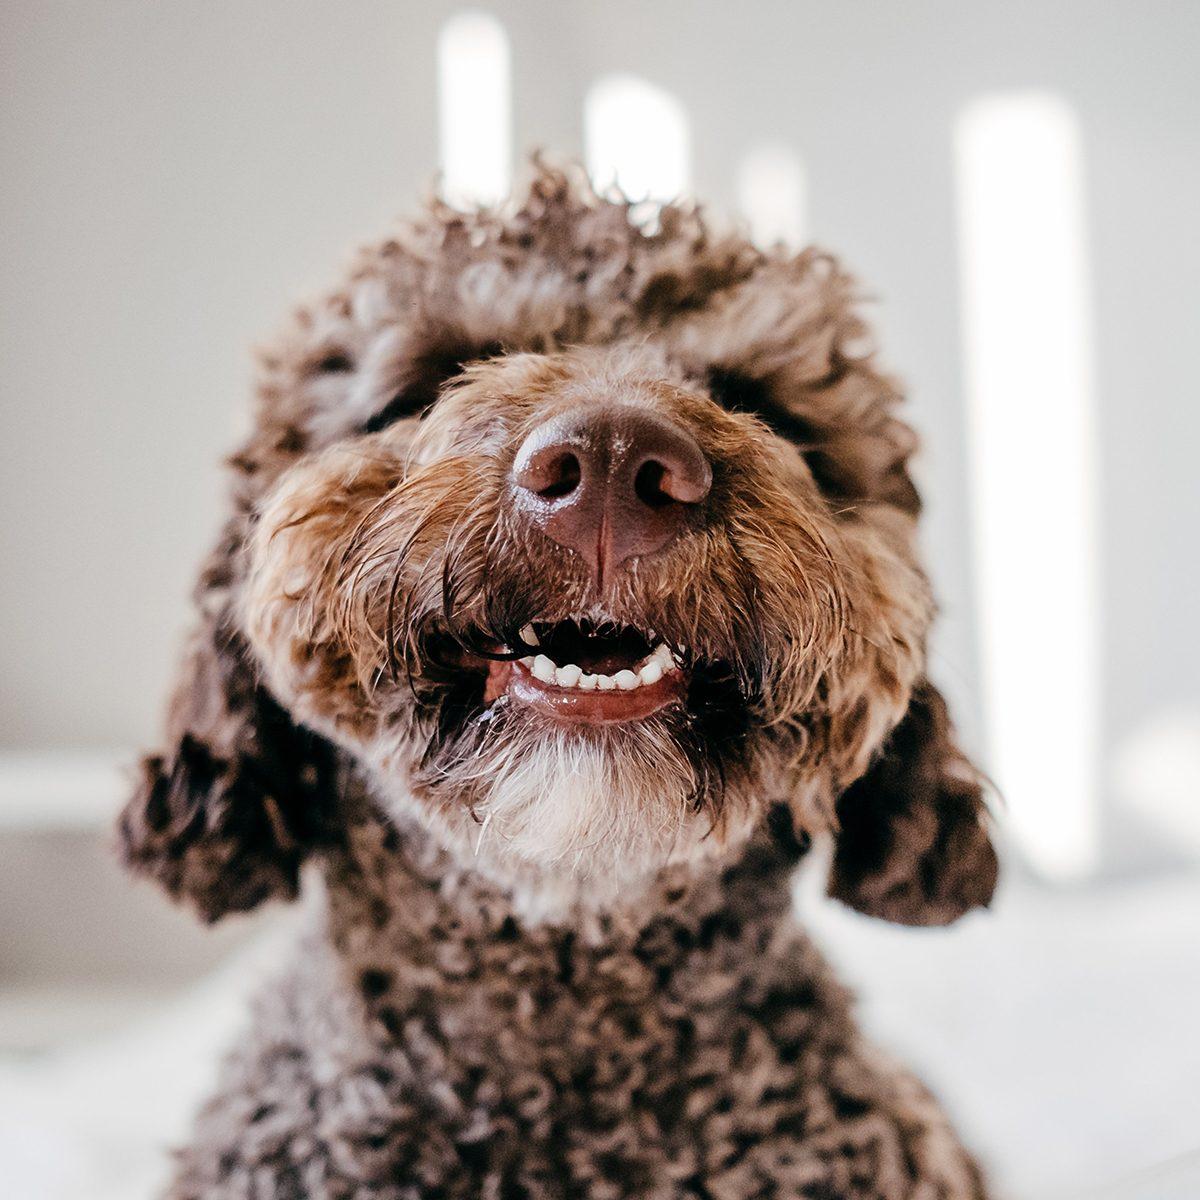 Furry dog close-up